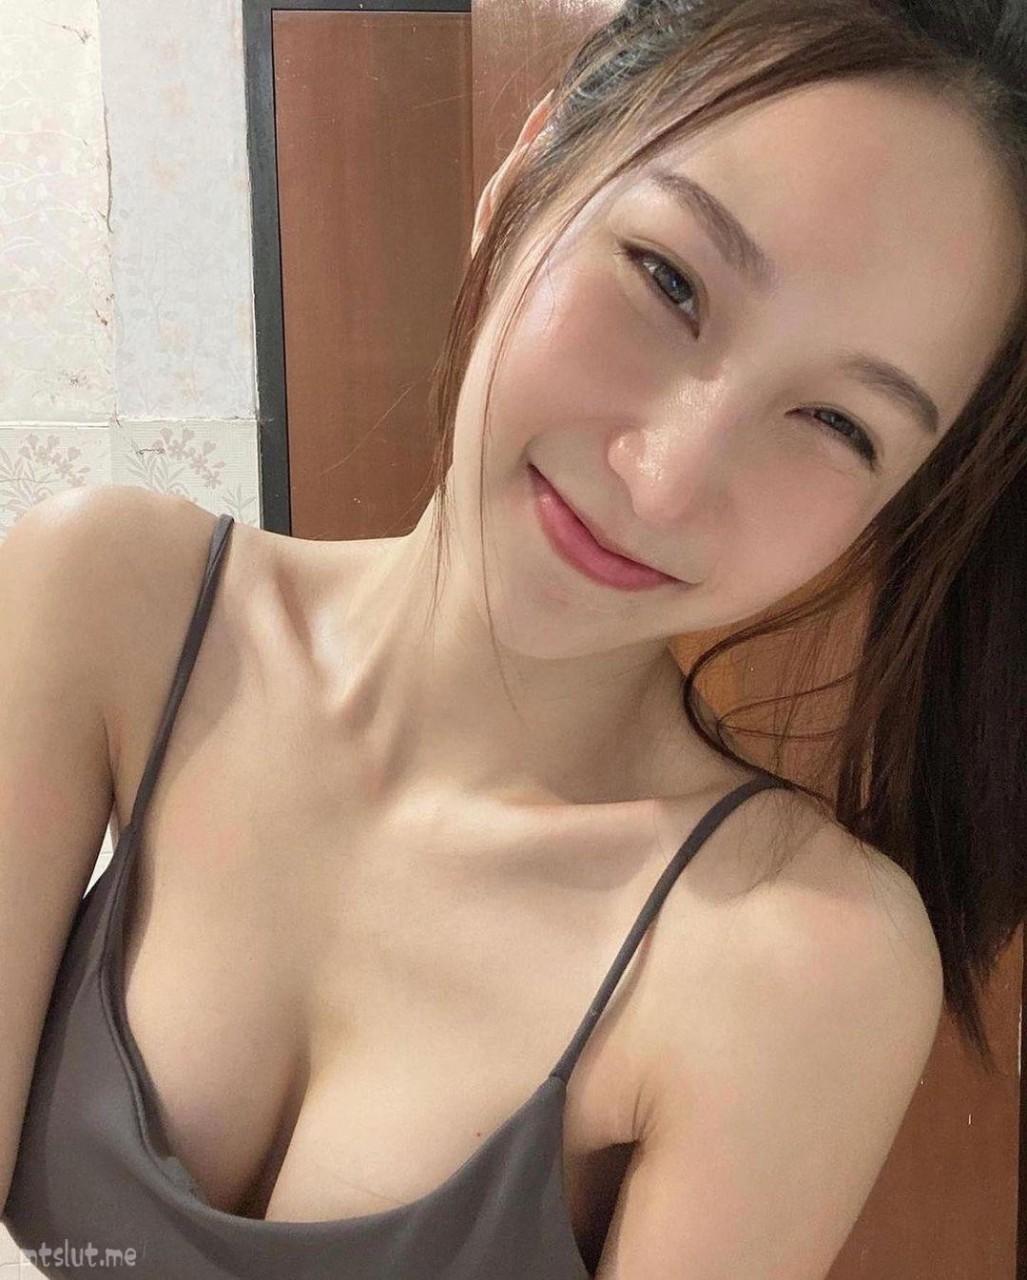 ins妹子图精选 — 第001期